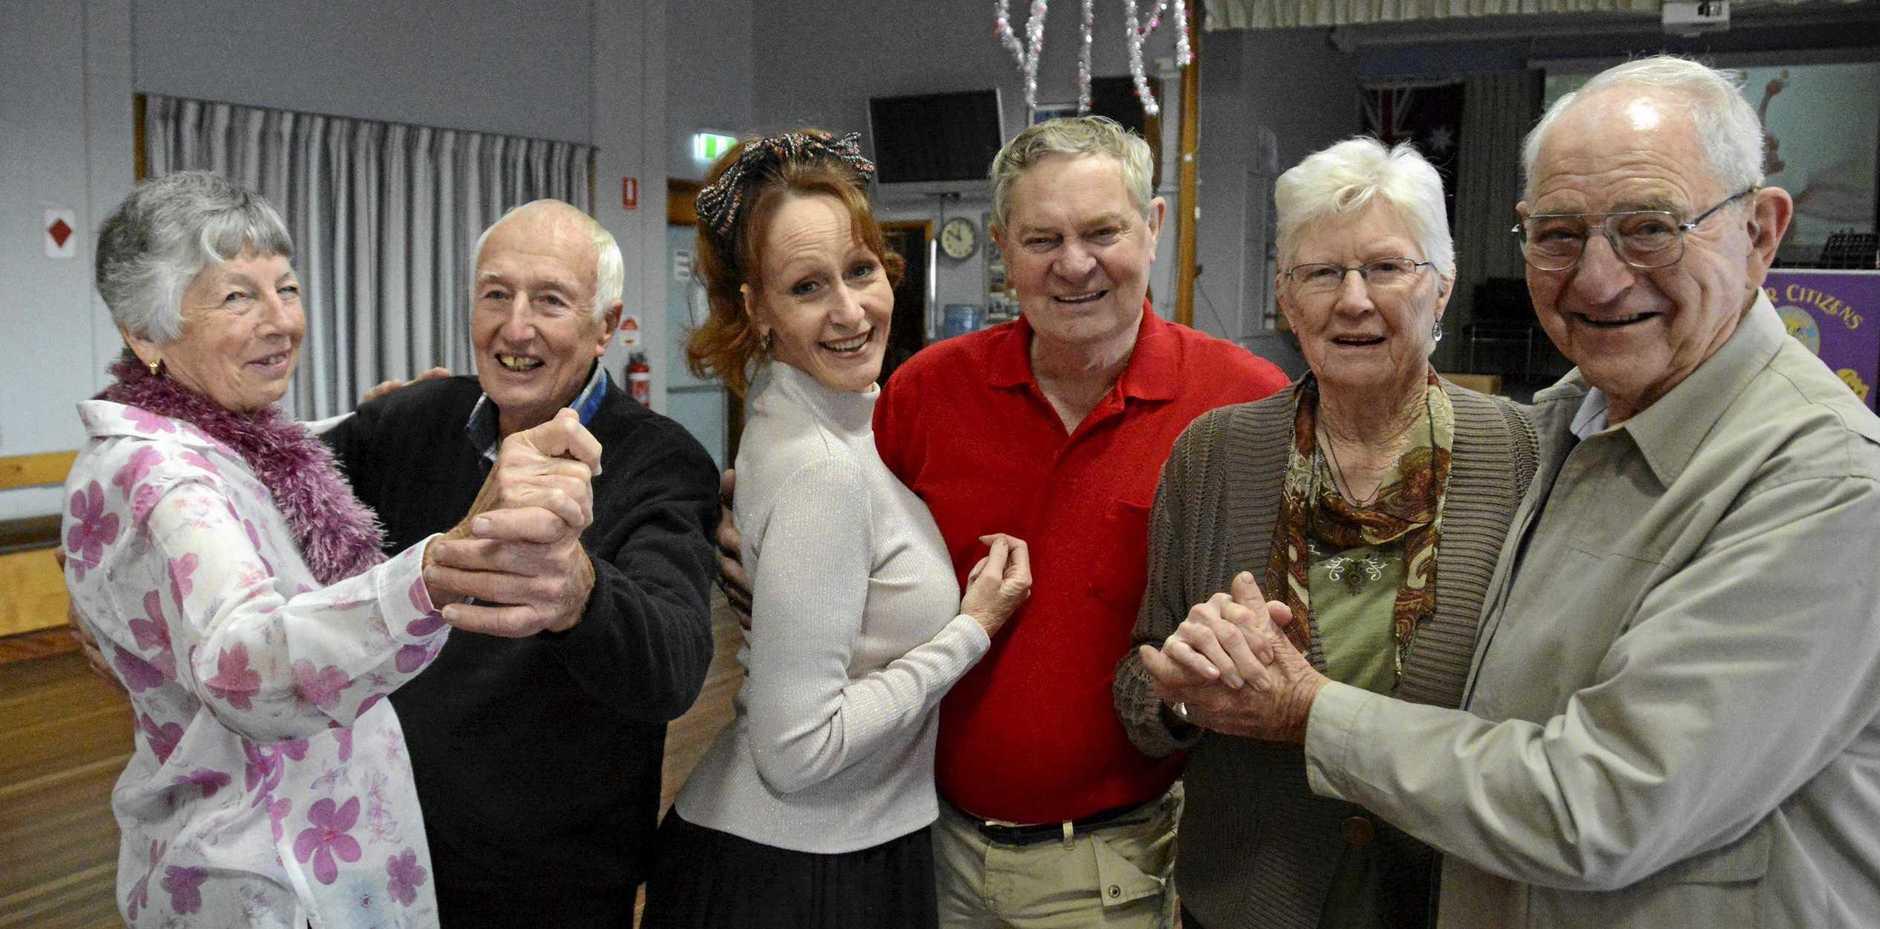 TOGETHER IN TUNE: Toowoomba Senior Citizens Club dancers (from left) Grace Atfield, John Jewell, Miranda Williams, Jim Hudson, Noella Edmondstone, Jim Nelson.